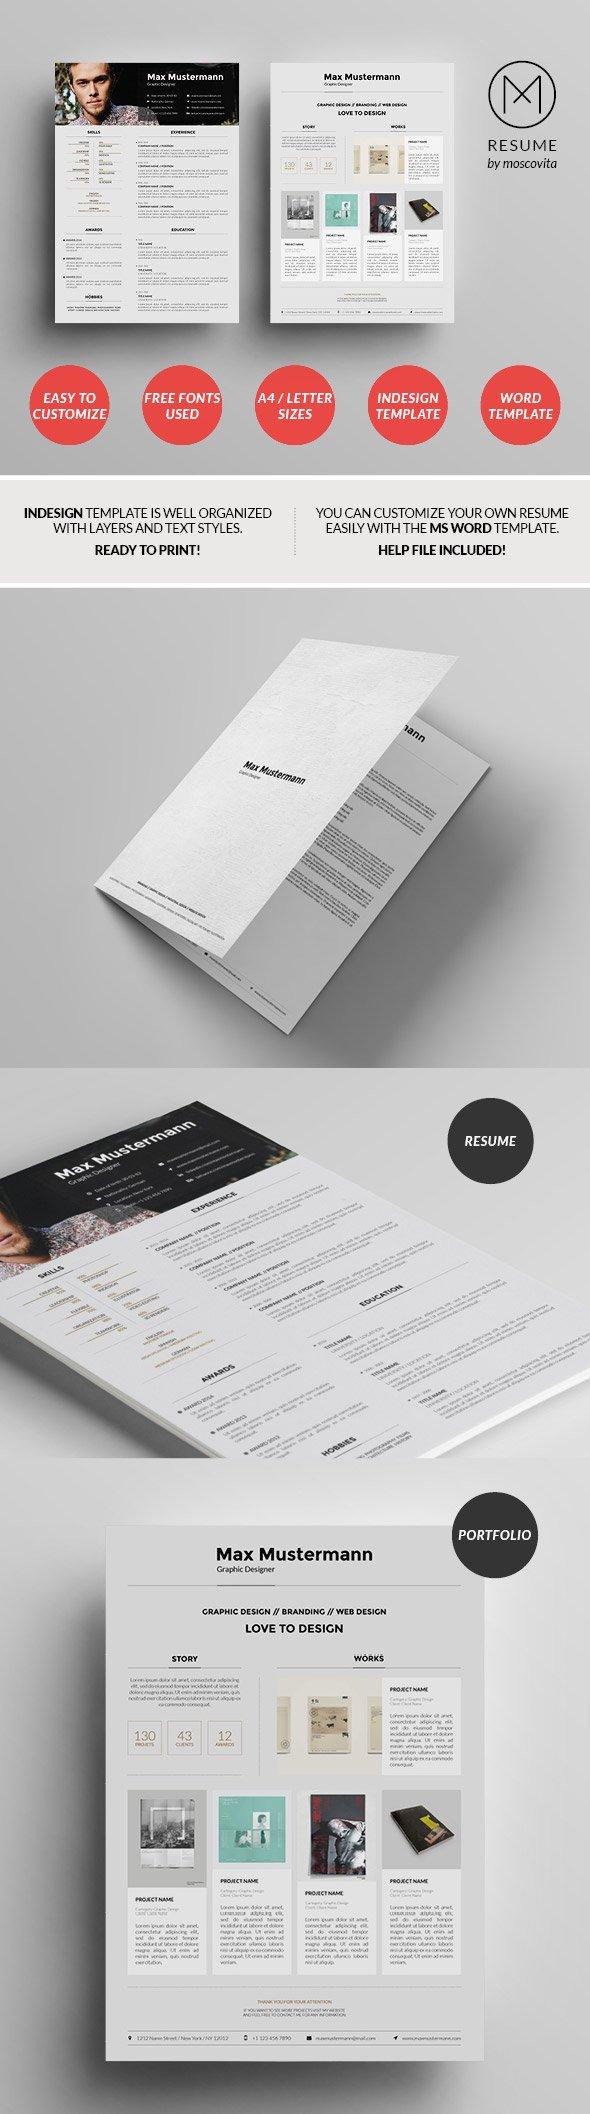 Structured Creative Resume Template Design